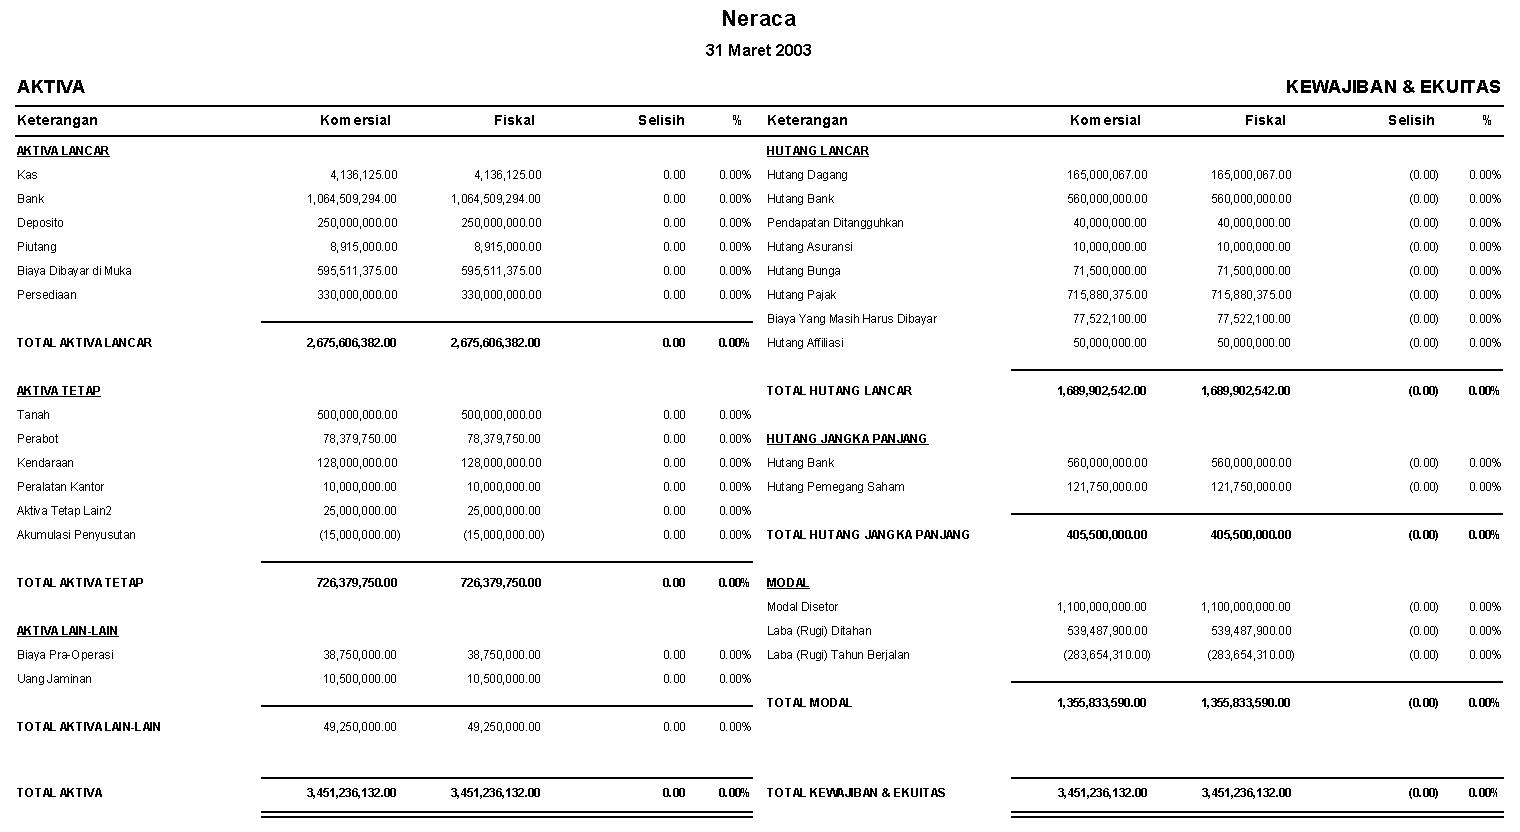 Contoh tampilan laporan Neraca KomparatifKomersial / Fiskal